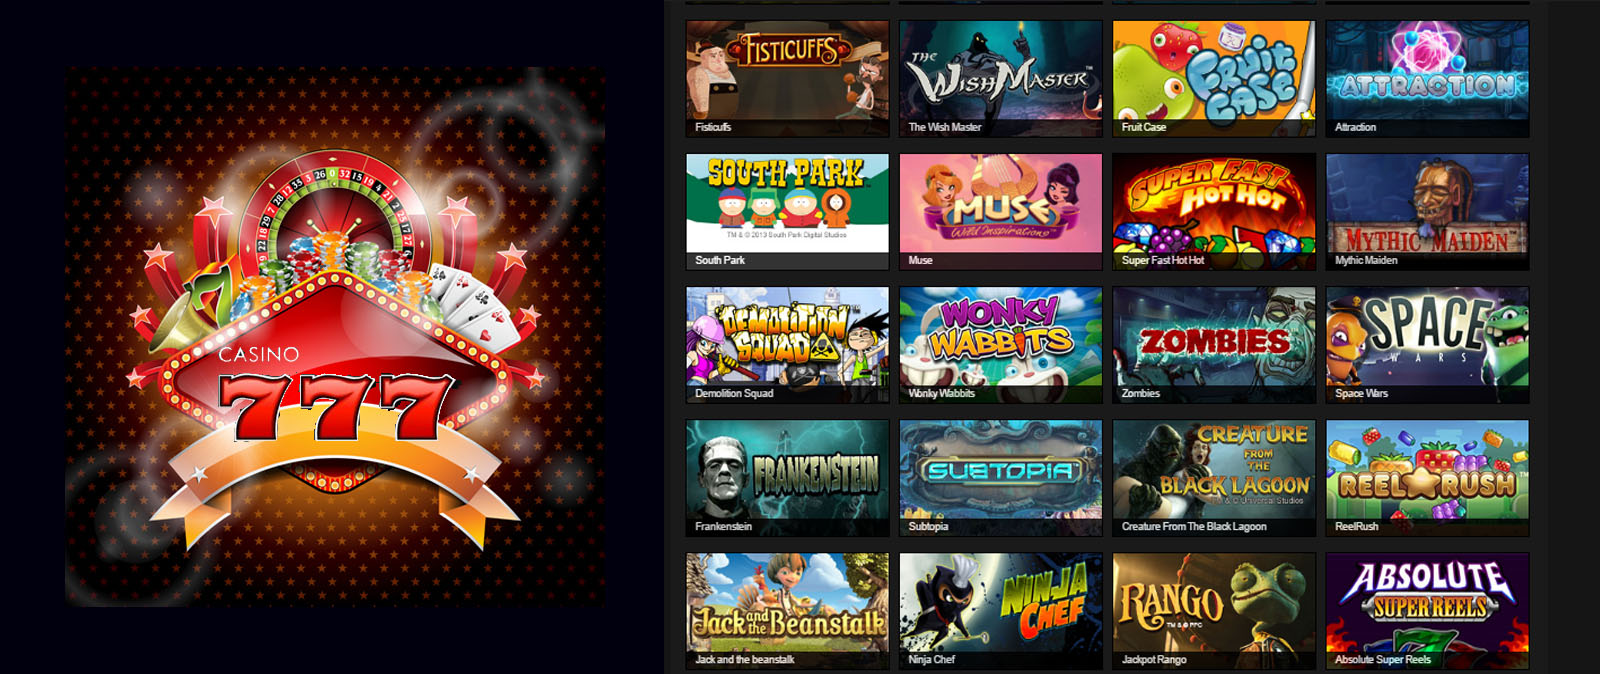 Juegos De Casino Sin Internet Casino Mesquite Nv